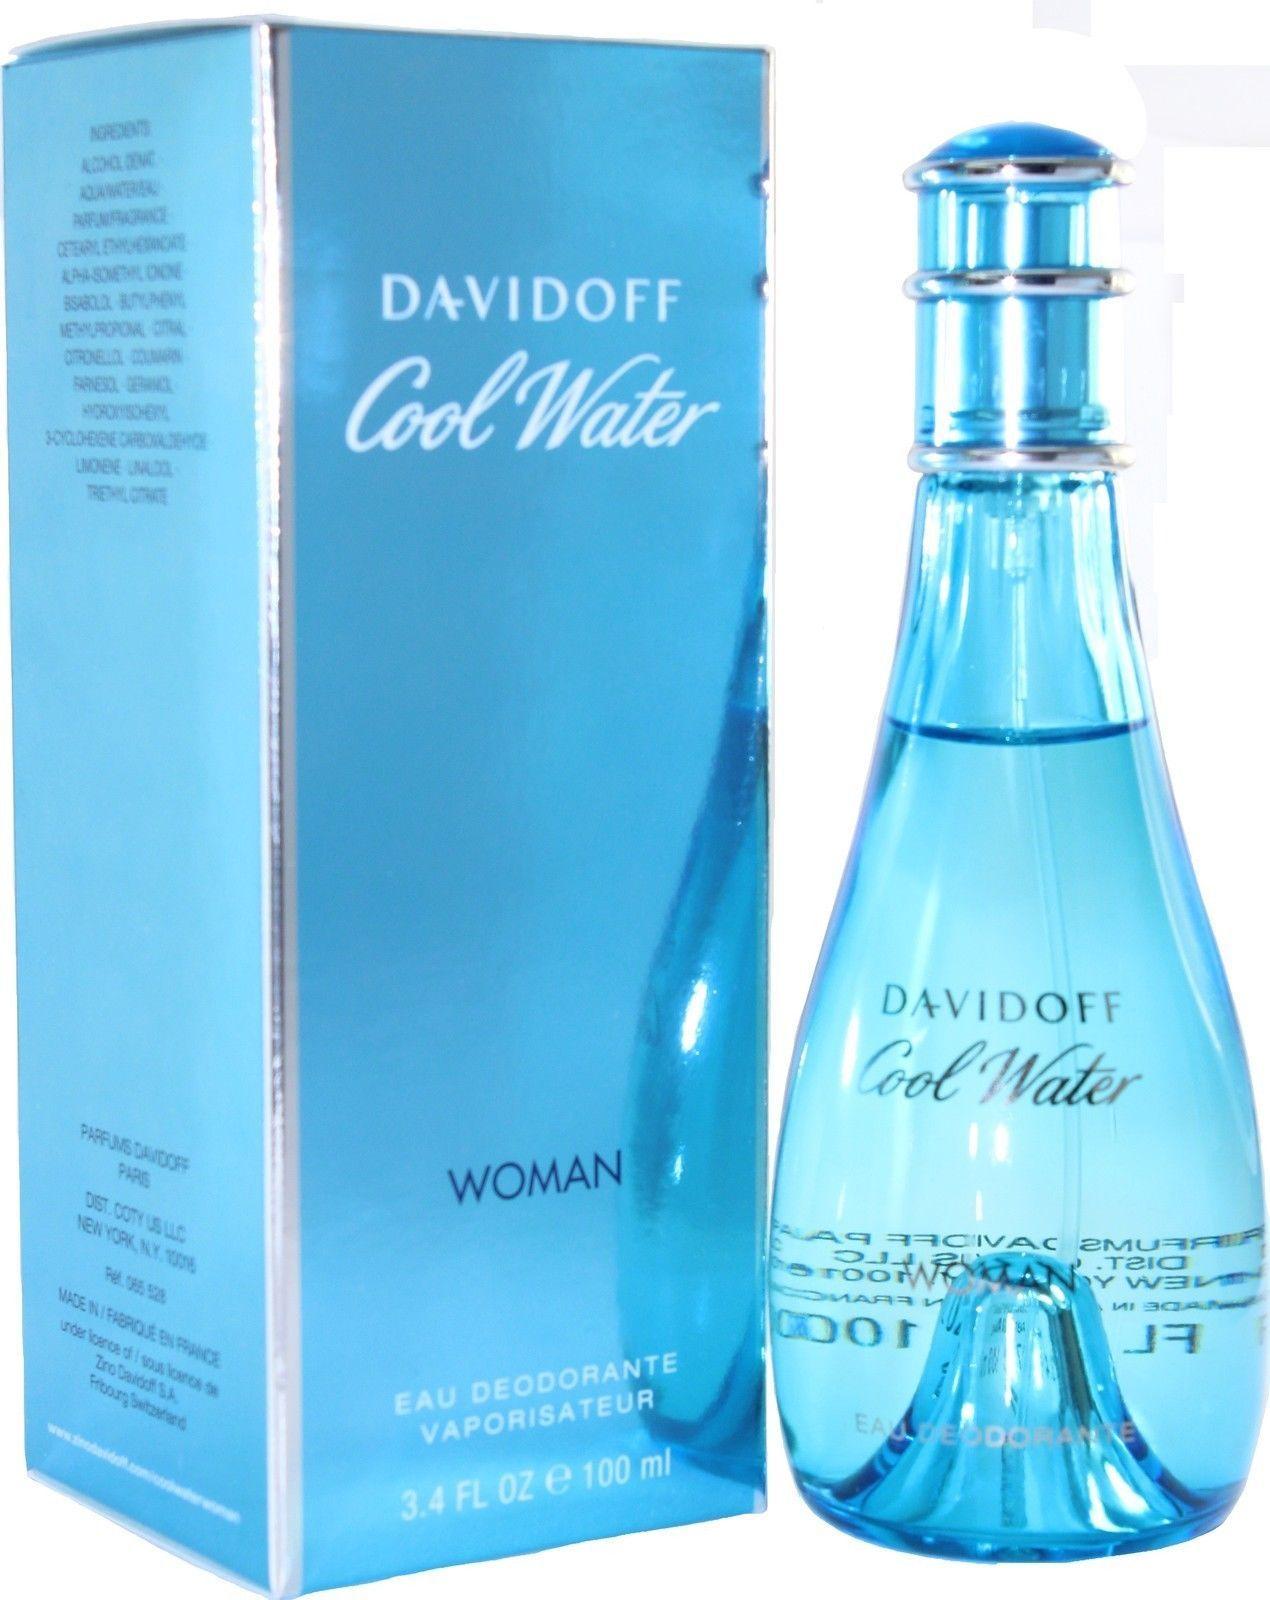 COOL  WATER  by  Davidoff  Perfume  Deodorant  Spray  3.4 / 3.3 OZ  / 100 ML NIB